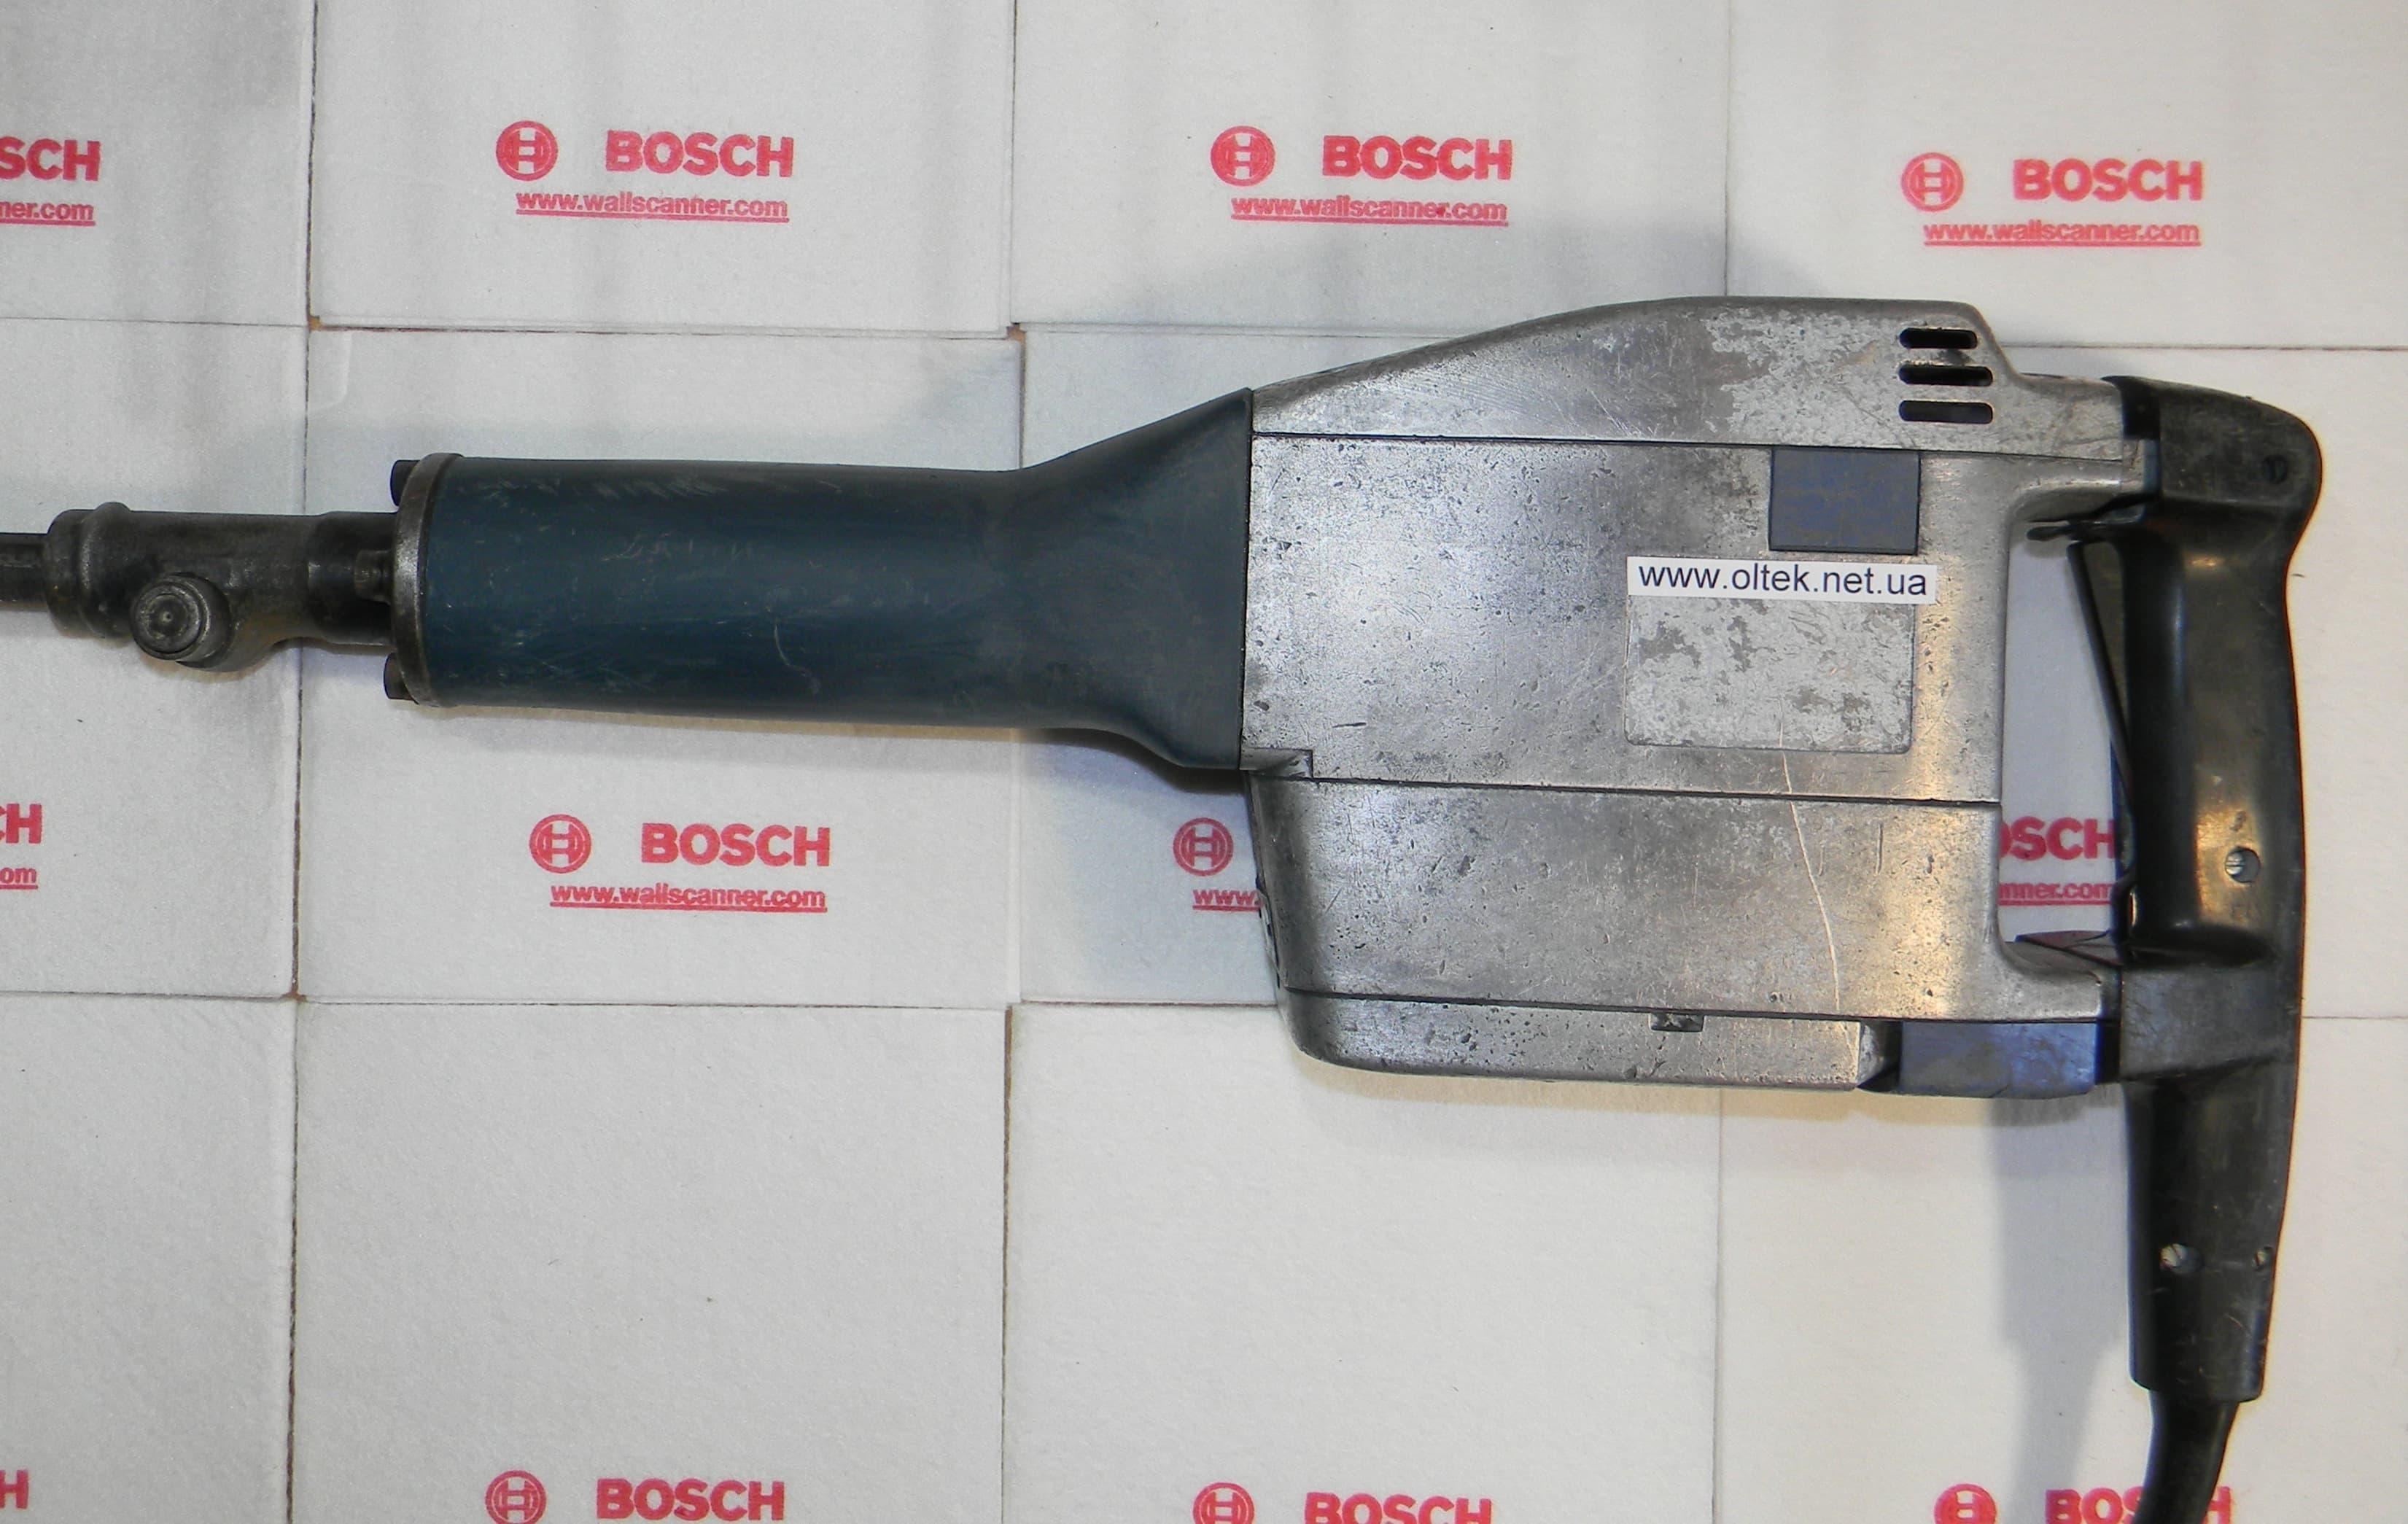 bosch-ush-10